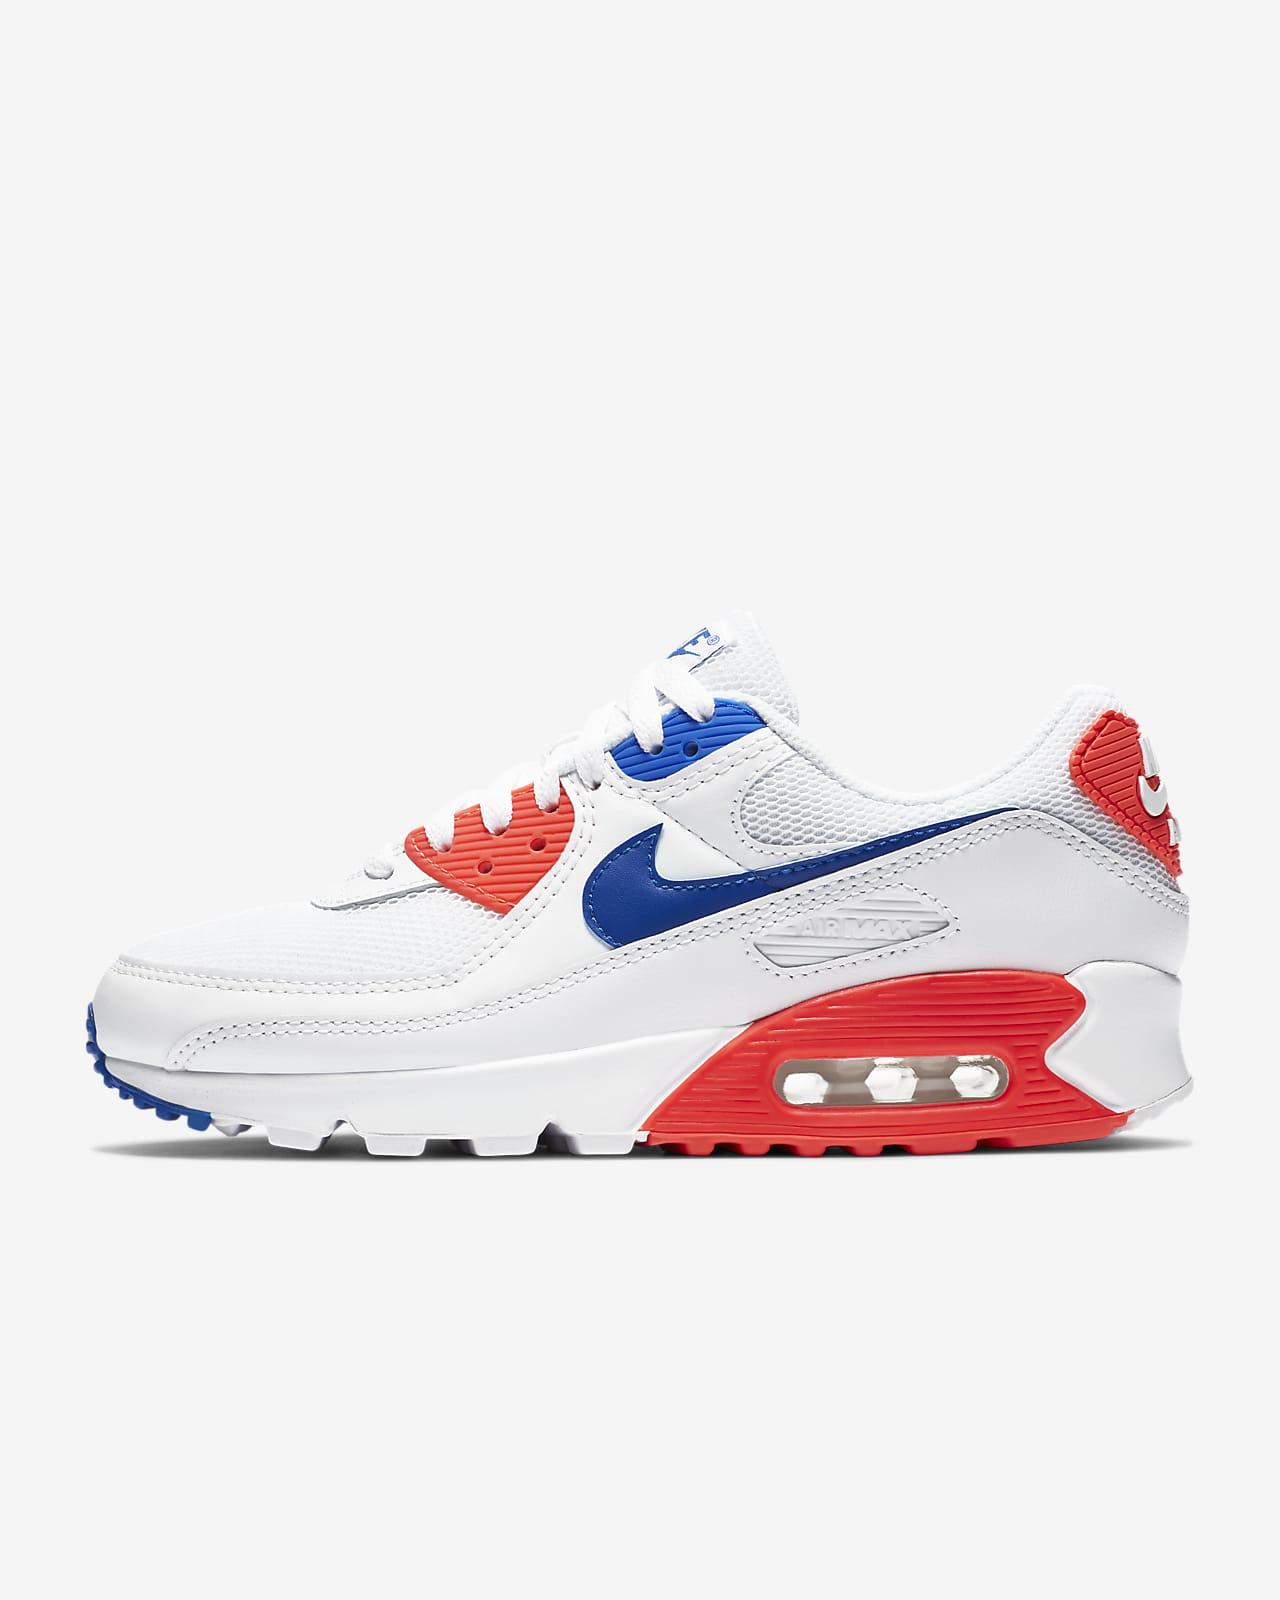 Nike Air Max 90 Women's Shoe. Nike NL